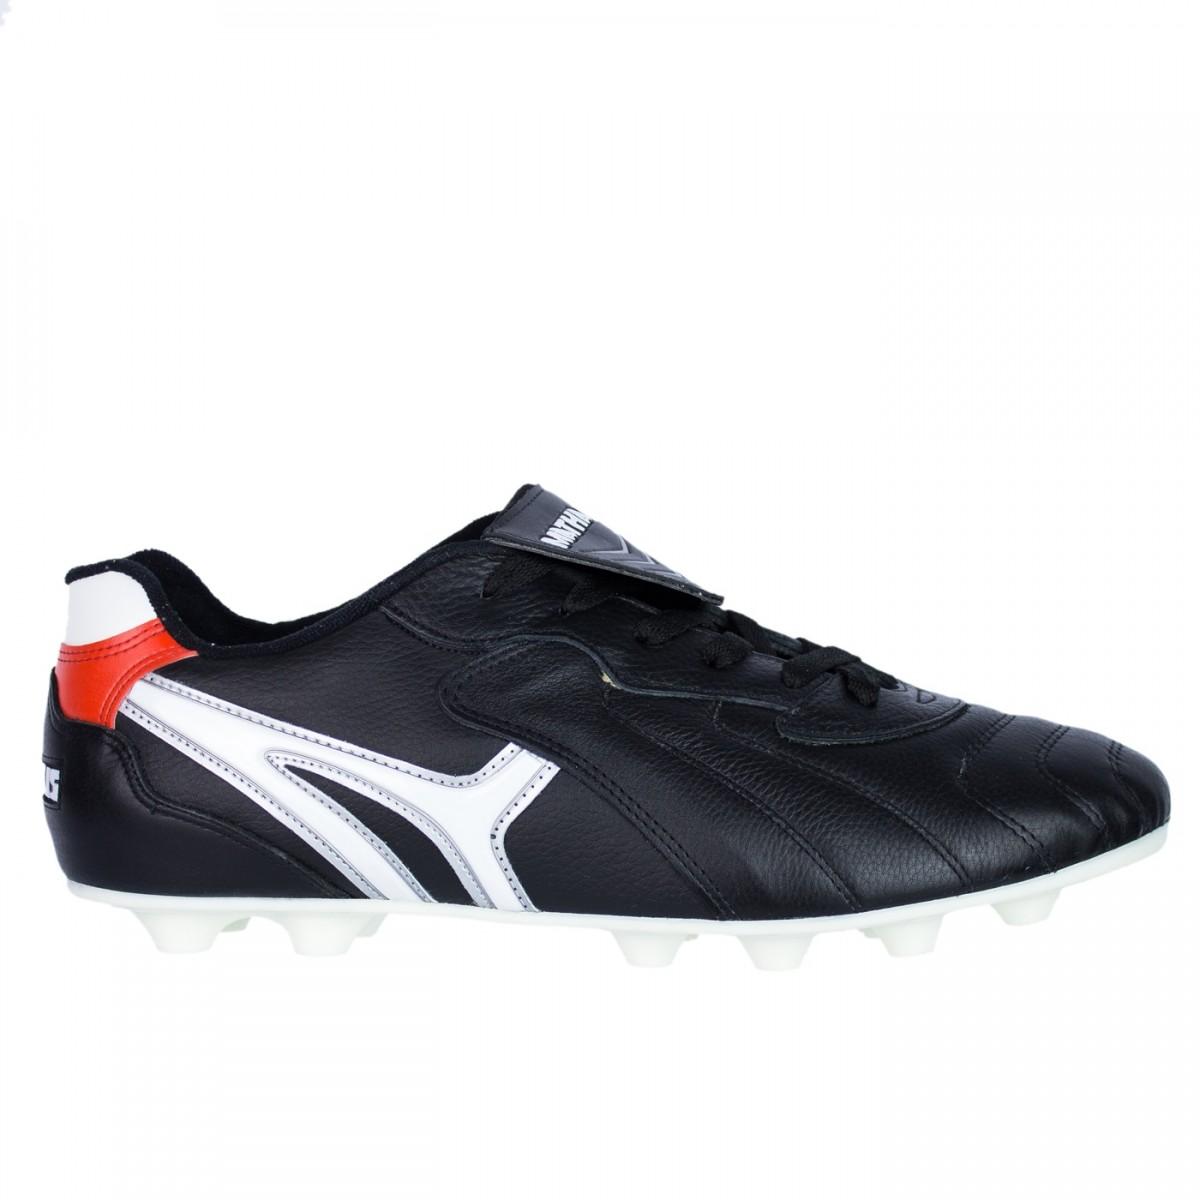 d11f38f91f Bizz Store - Chuteira Futebol de Campo Mathaus Veneza Preta